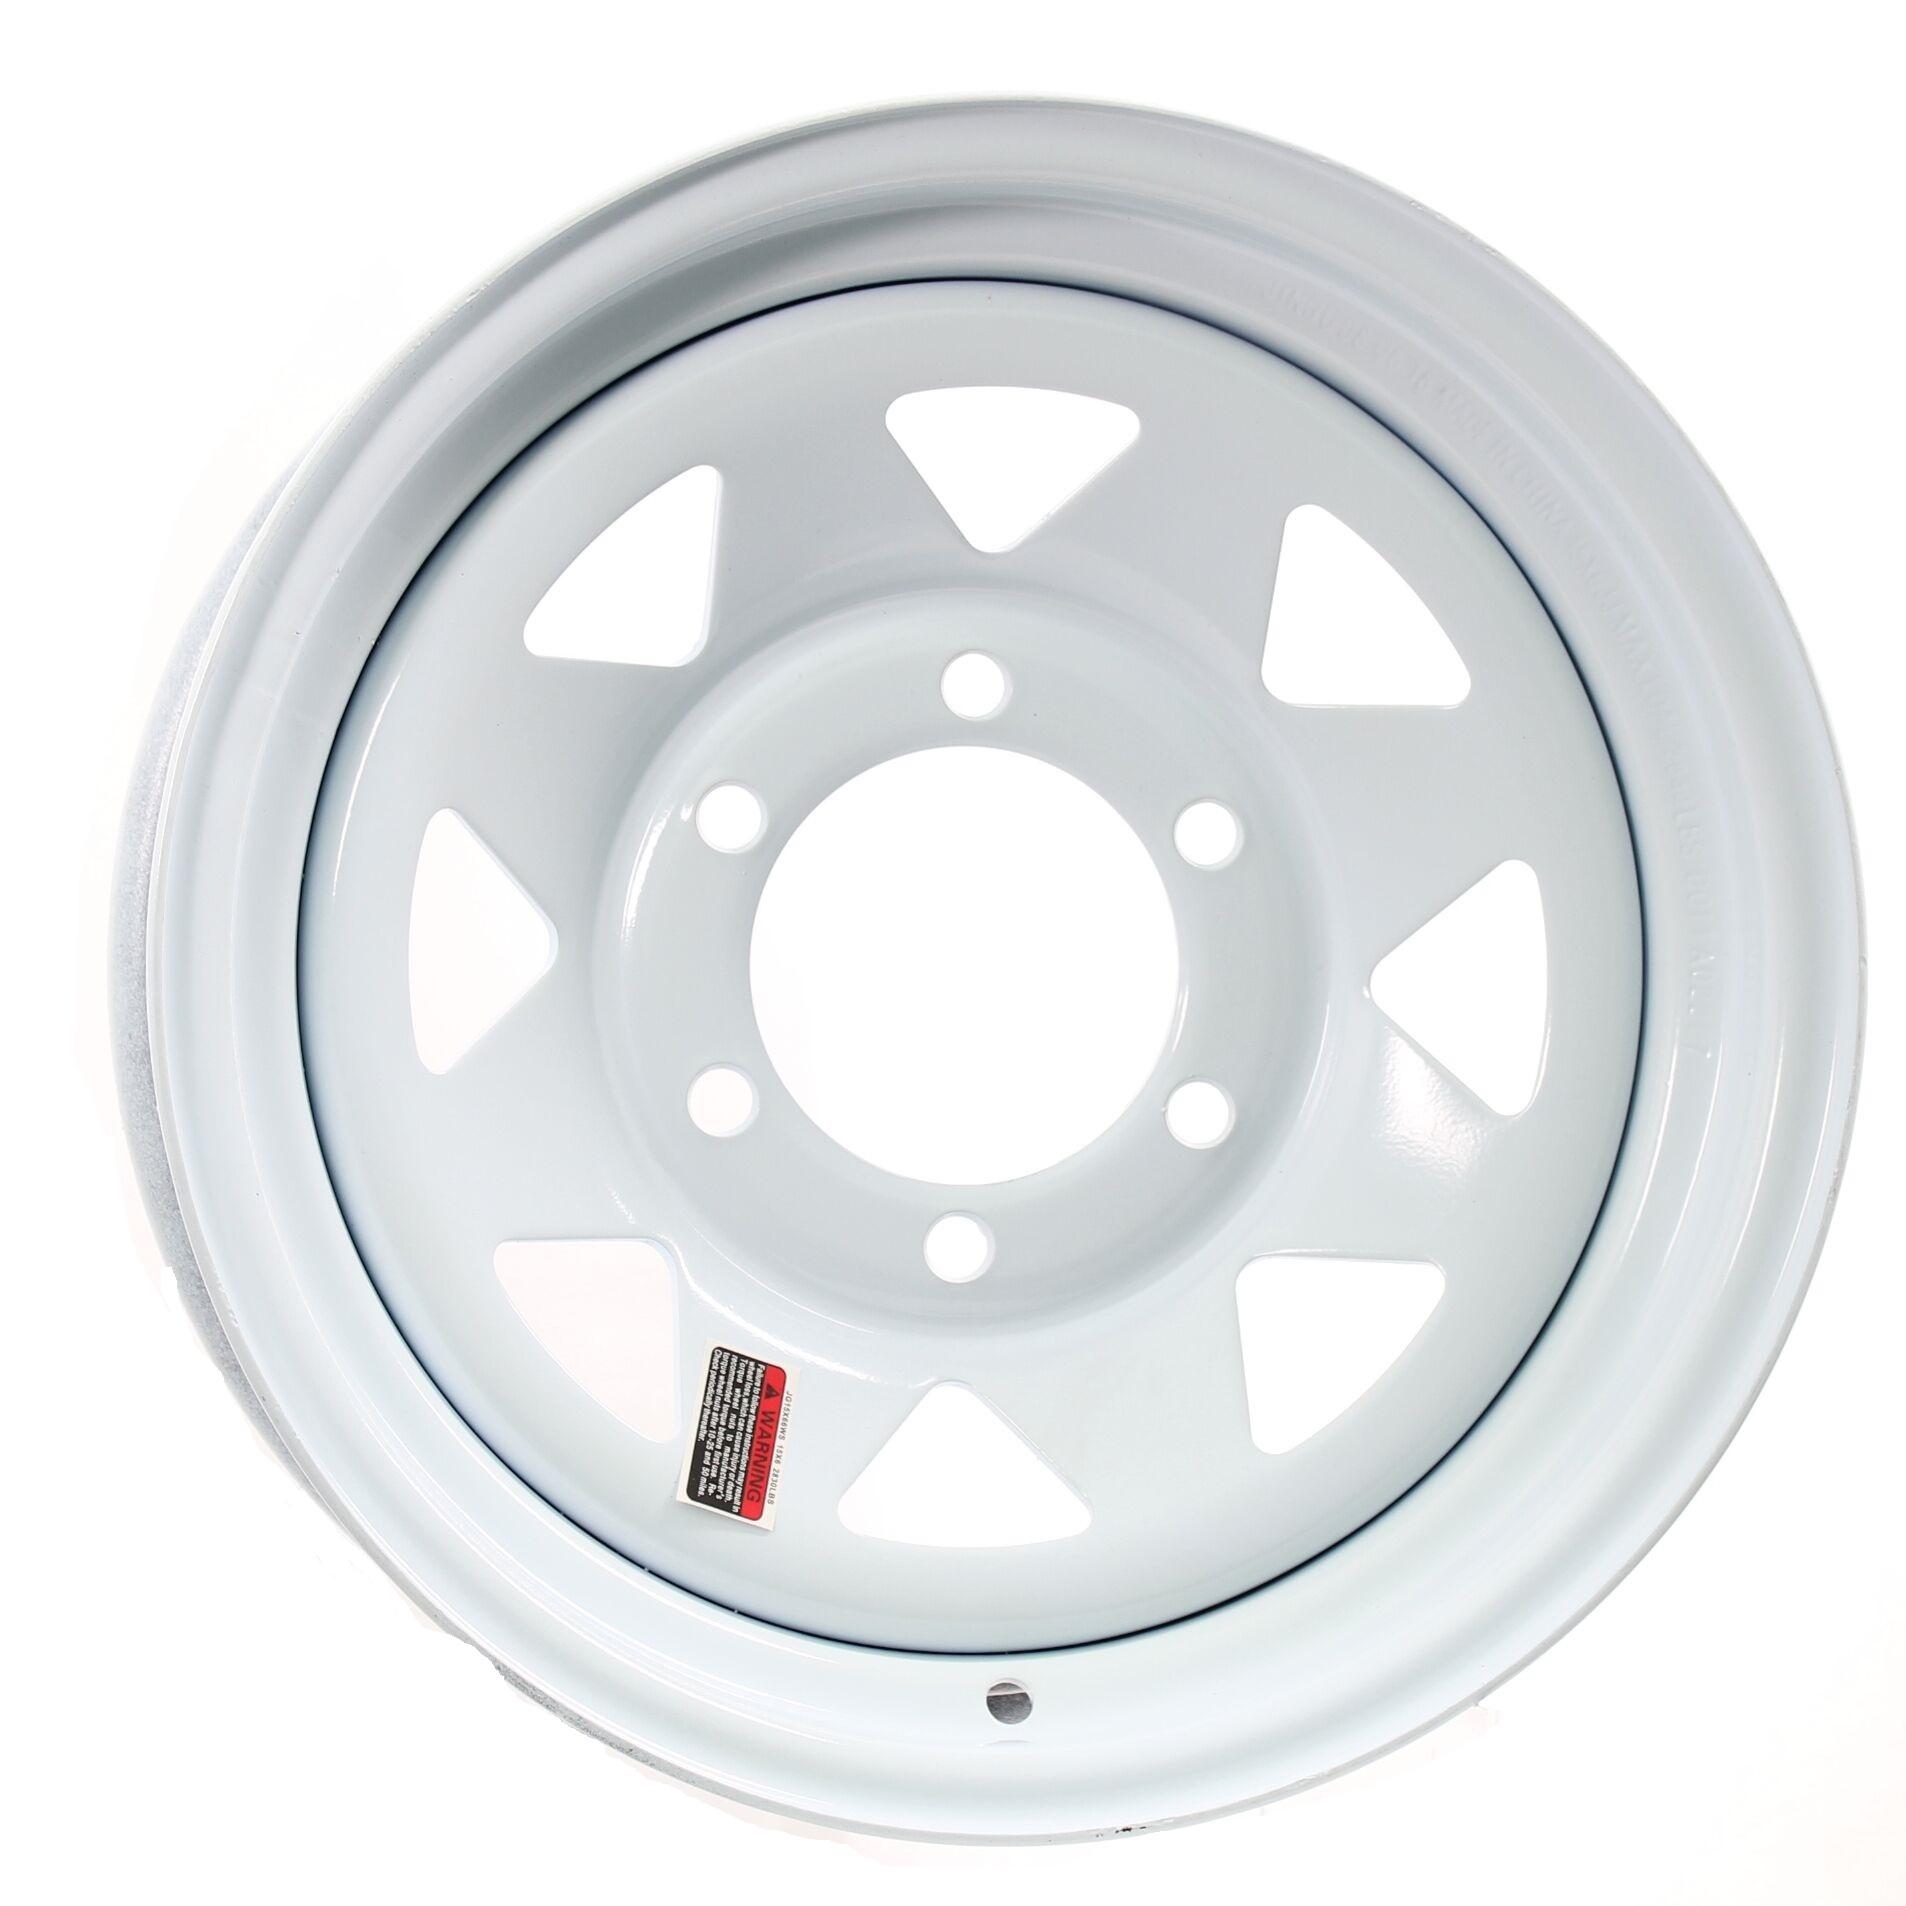 6-5.5 Bolt Circle 15 x 6 Silver Modular Trailer Wheel